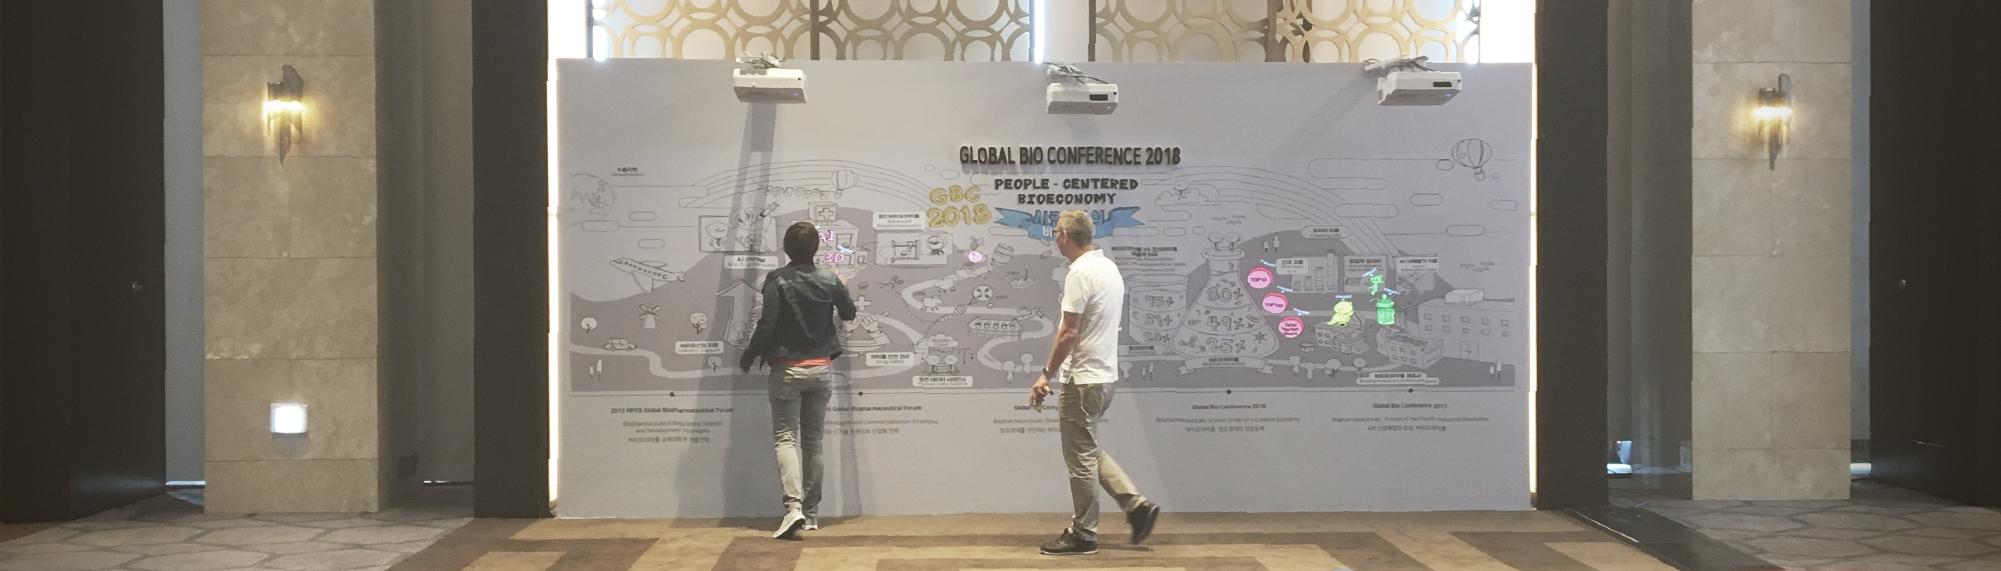 GLOBAL BIO CONFERENCE 2018